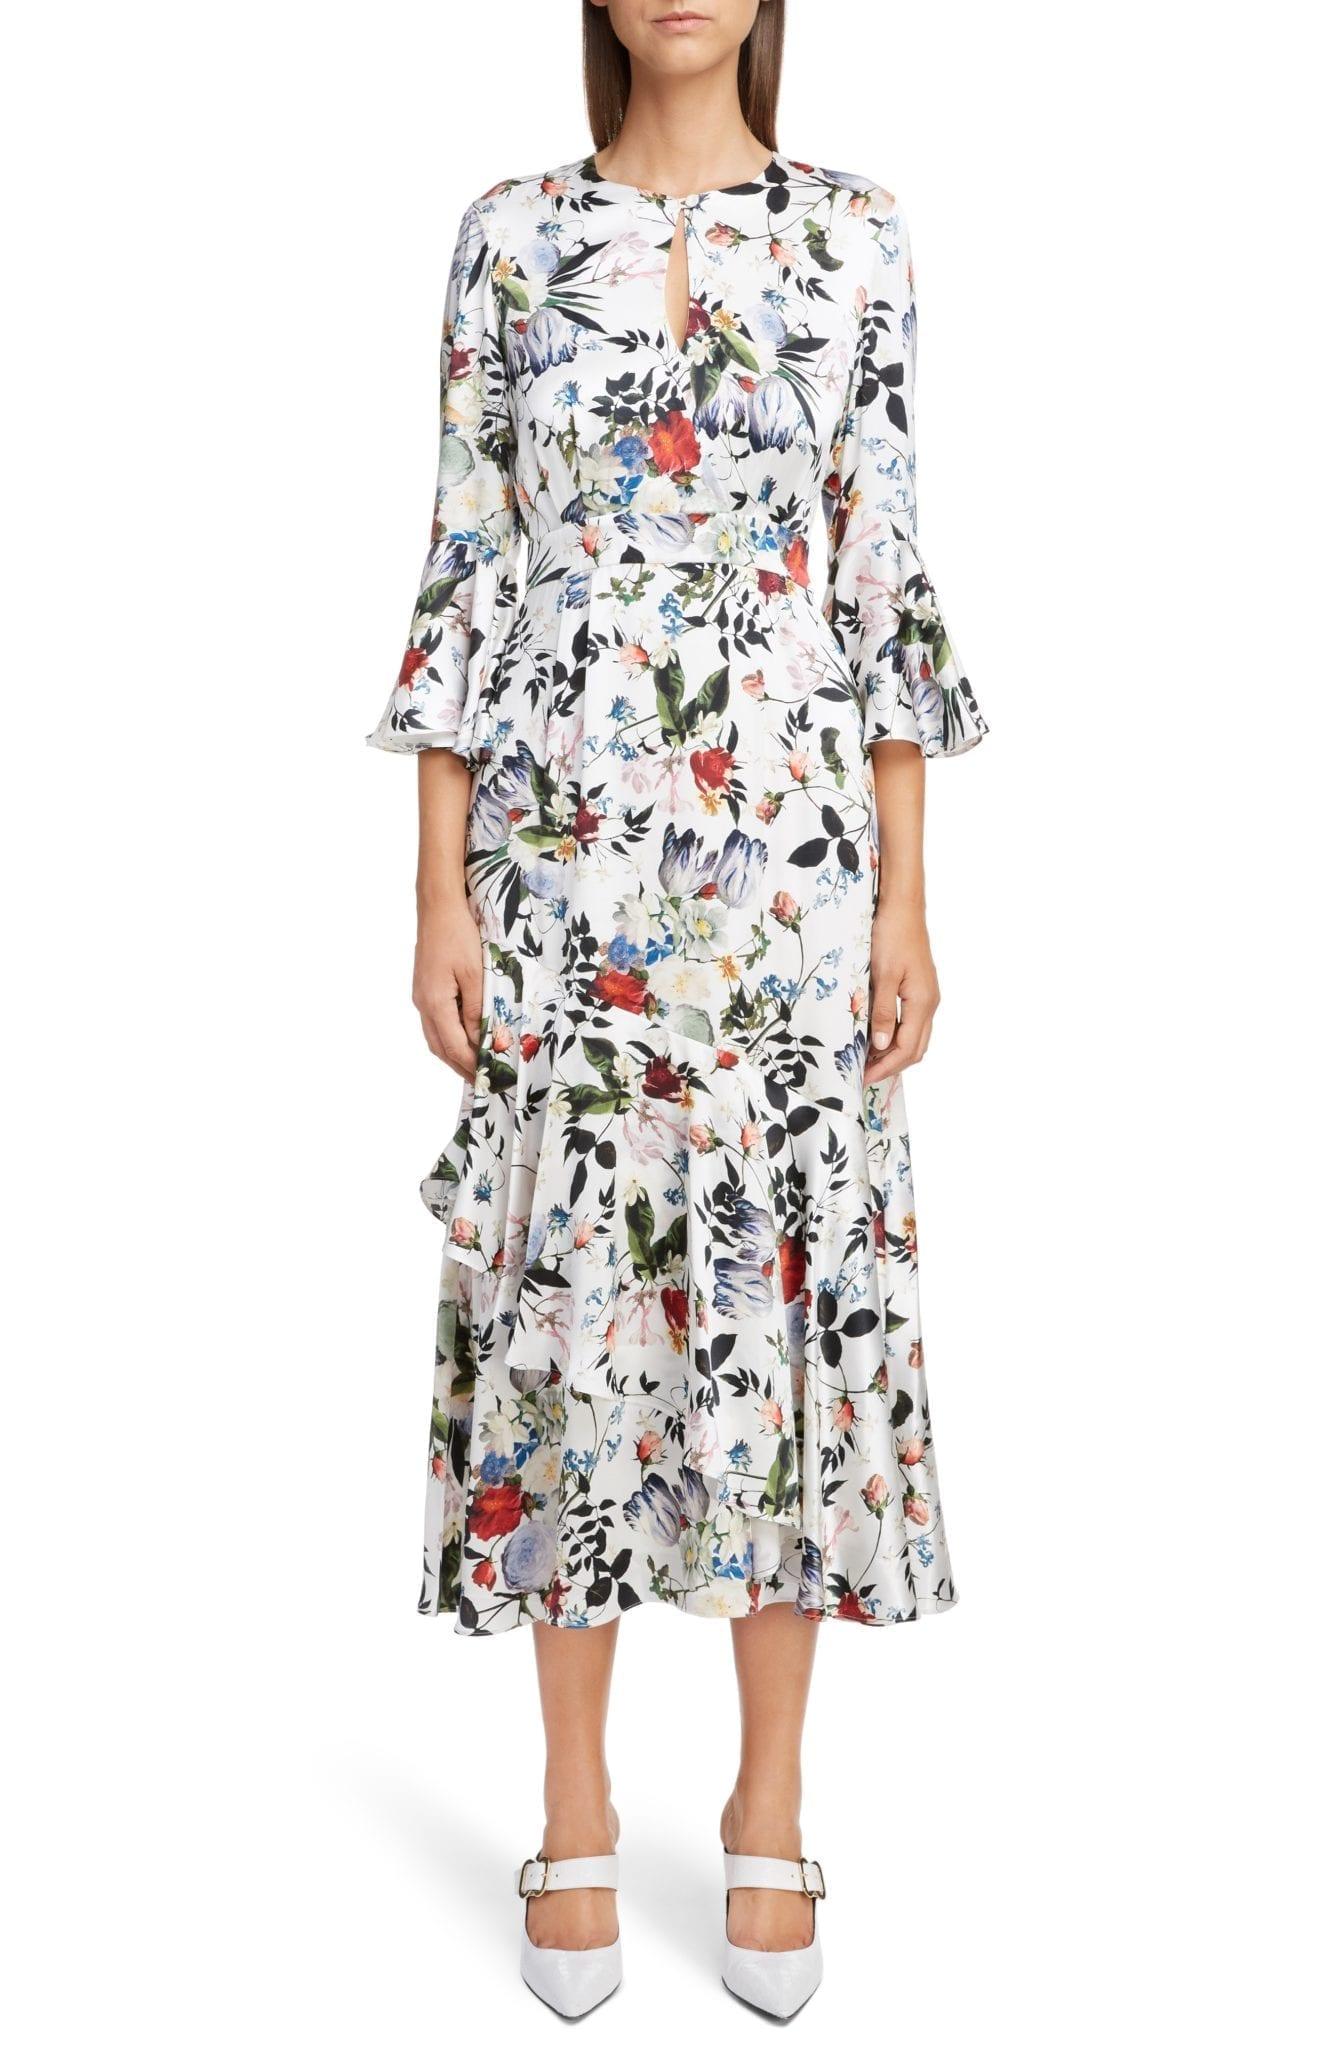 ERDEM Silk Satin Frill Midi White / Floral Printed Dress